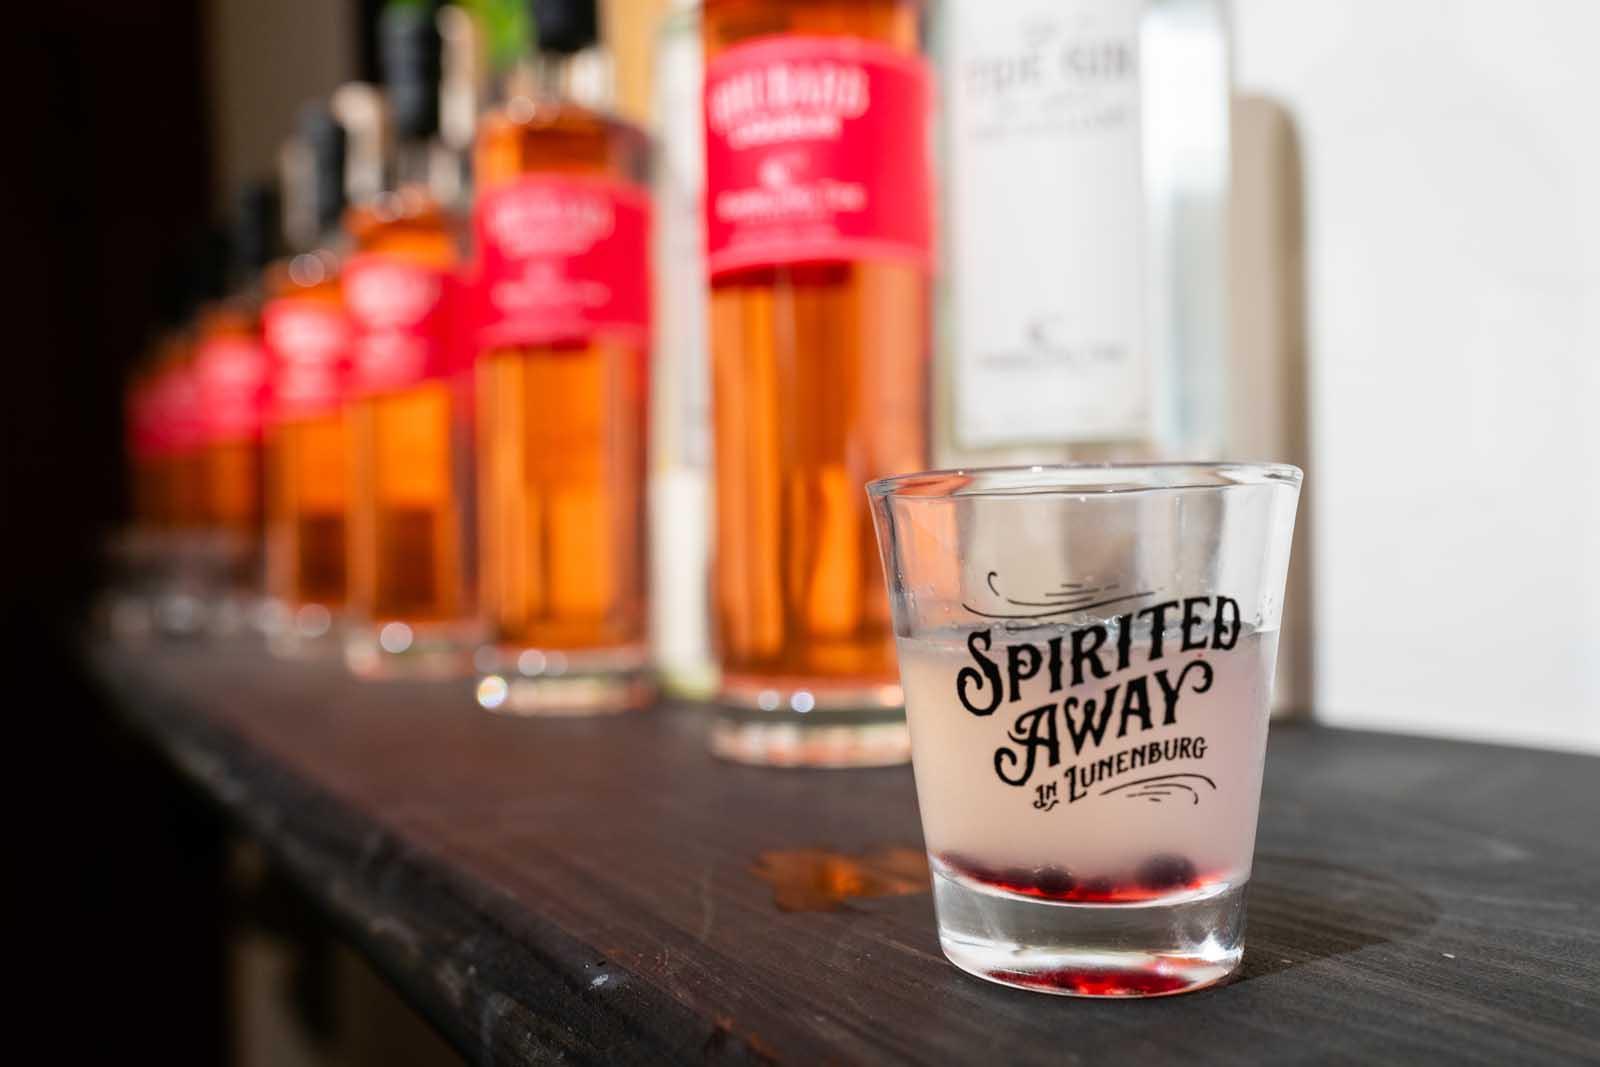 Spirited Away drink at the festival in Lunenburg Nova Scotia